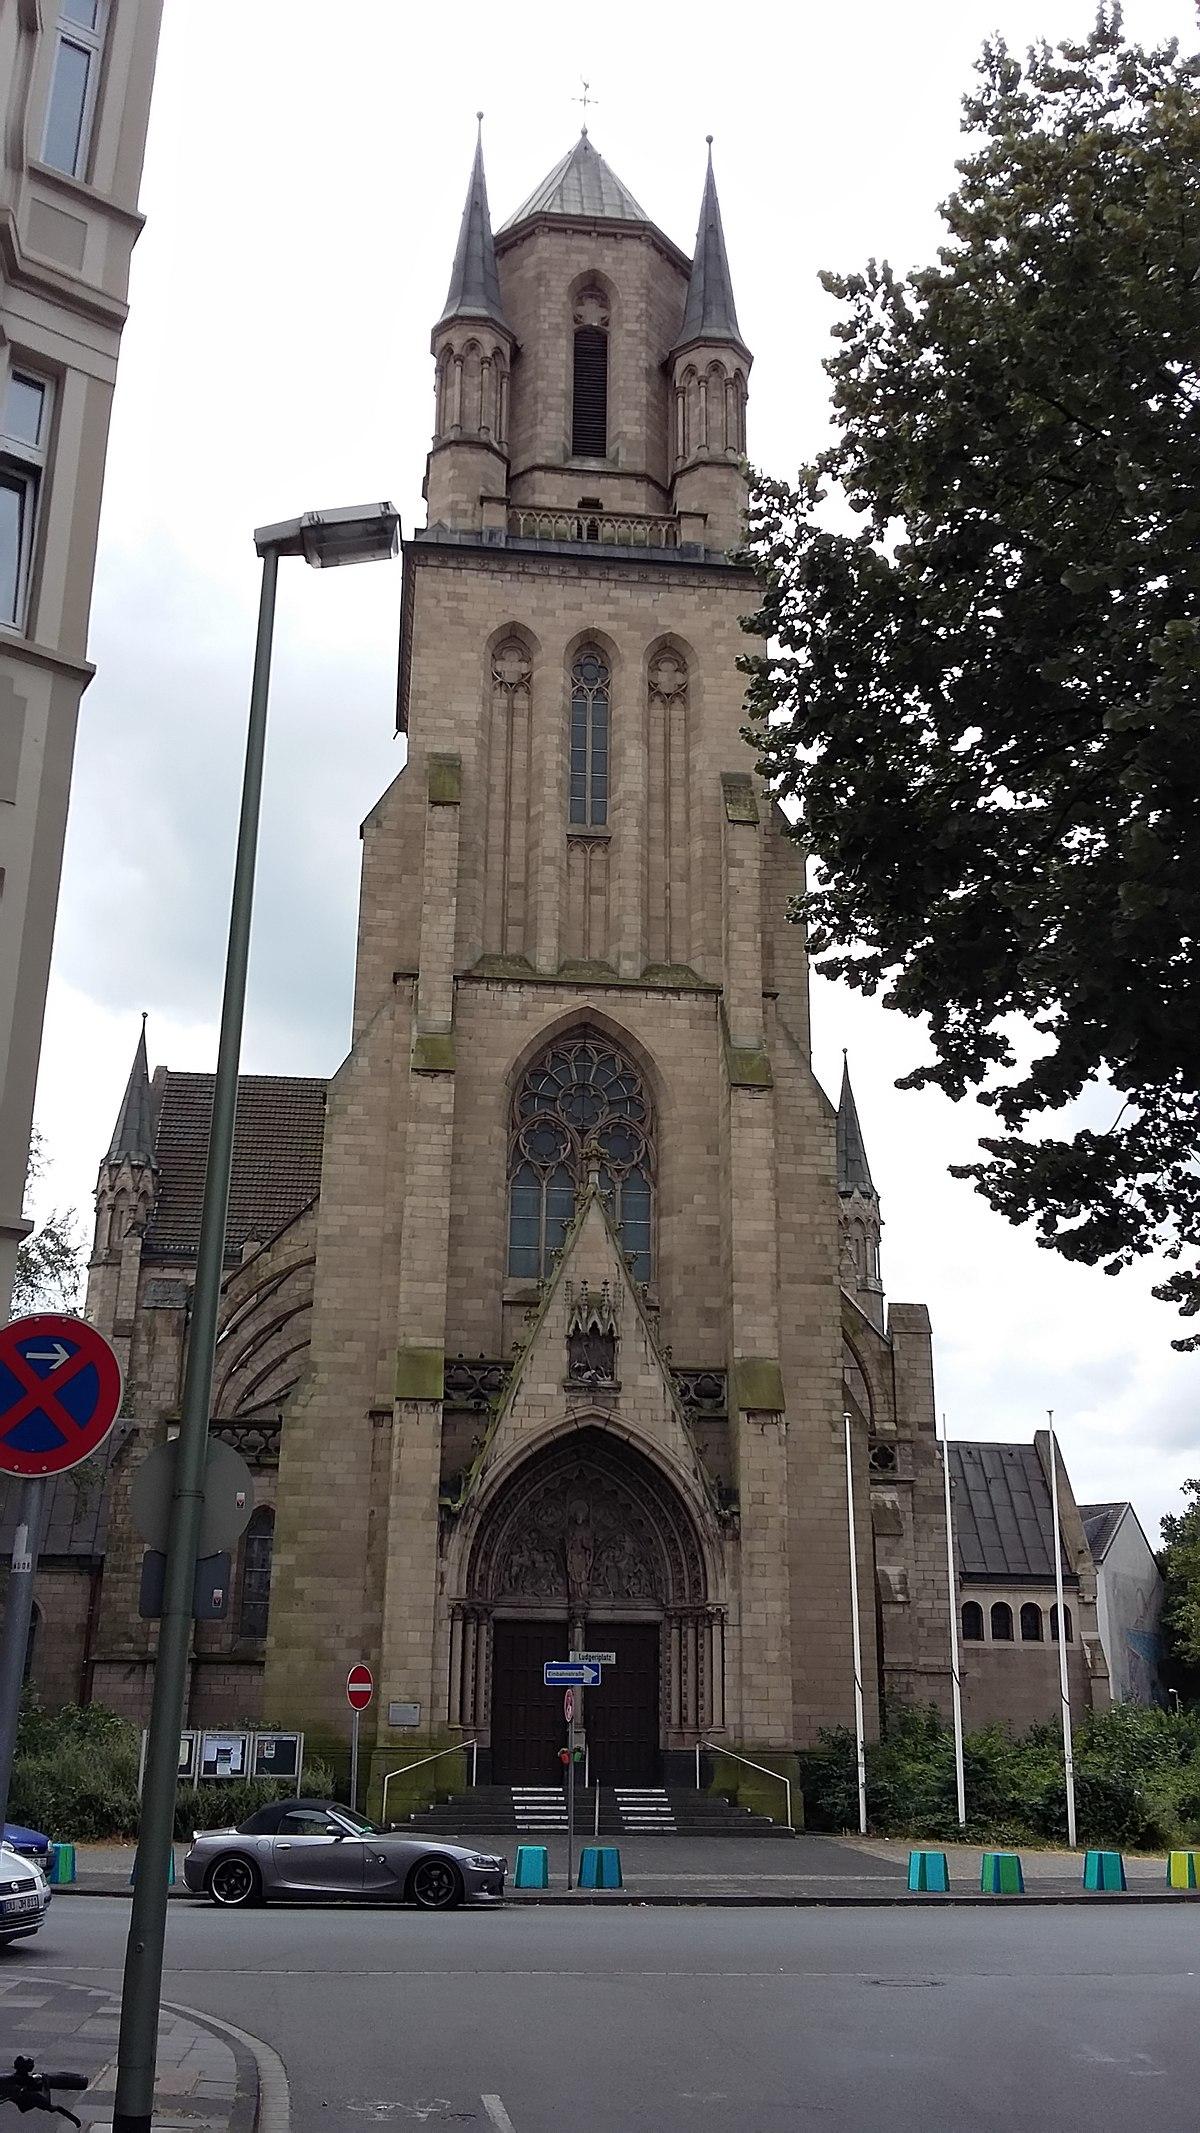 Wetter Duisburg Neudorf